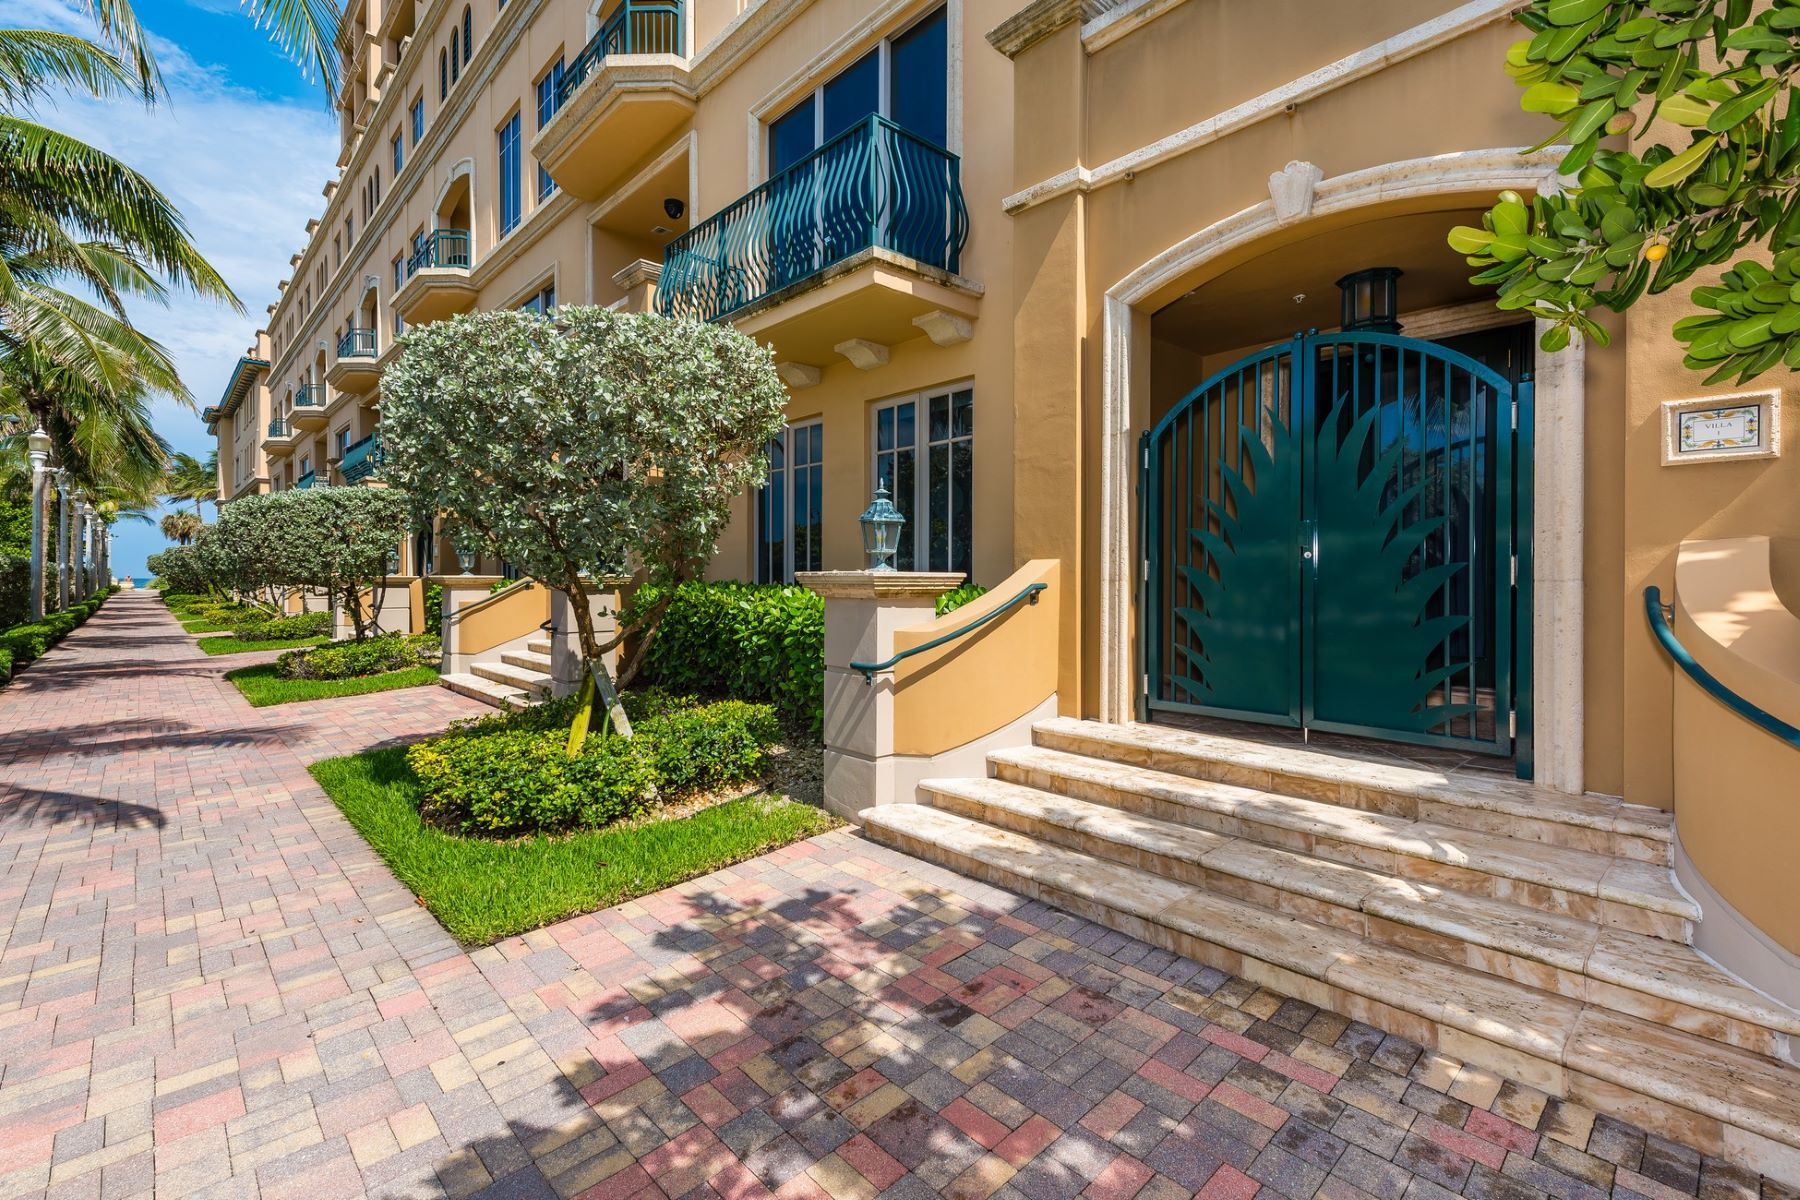 Condominium for Sale at 3501 N Ocean Dr. # V1 Hollywood, Florida 33019 United States